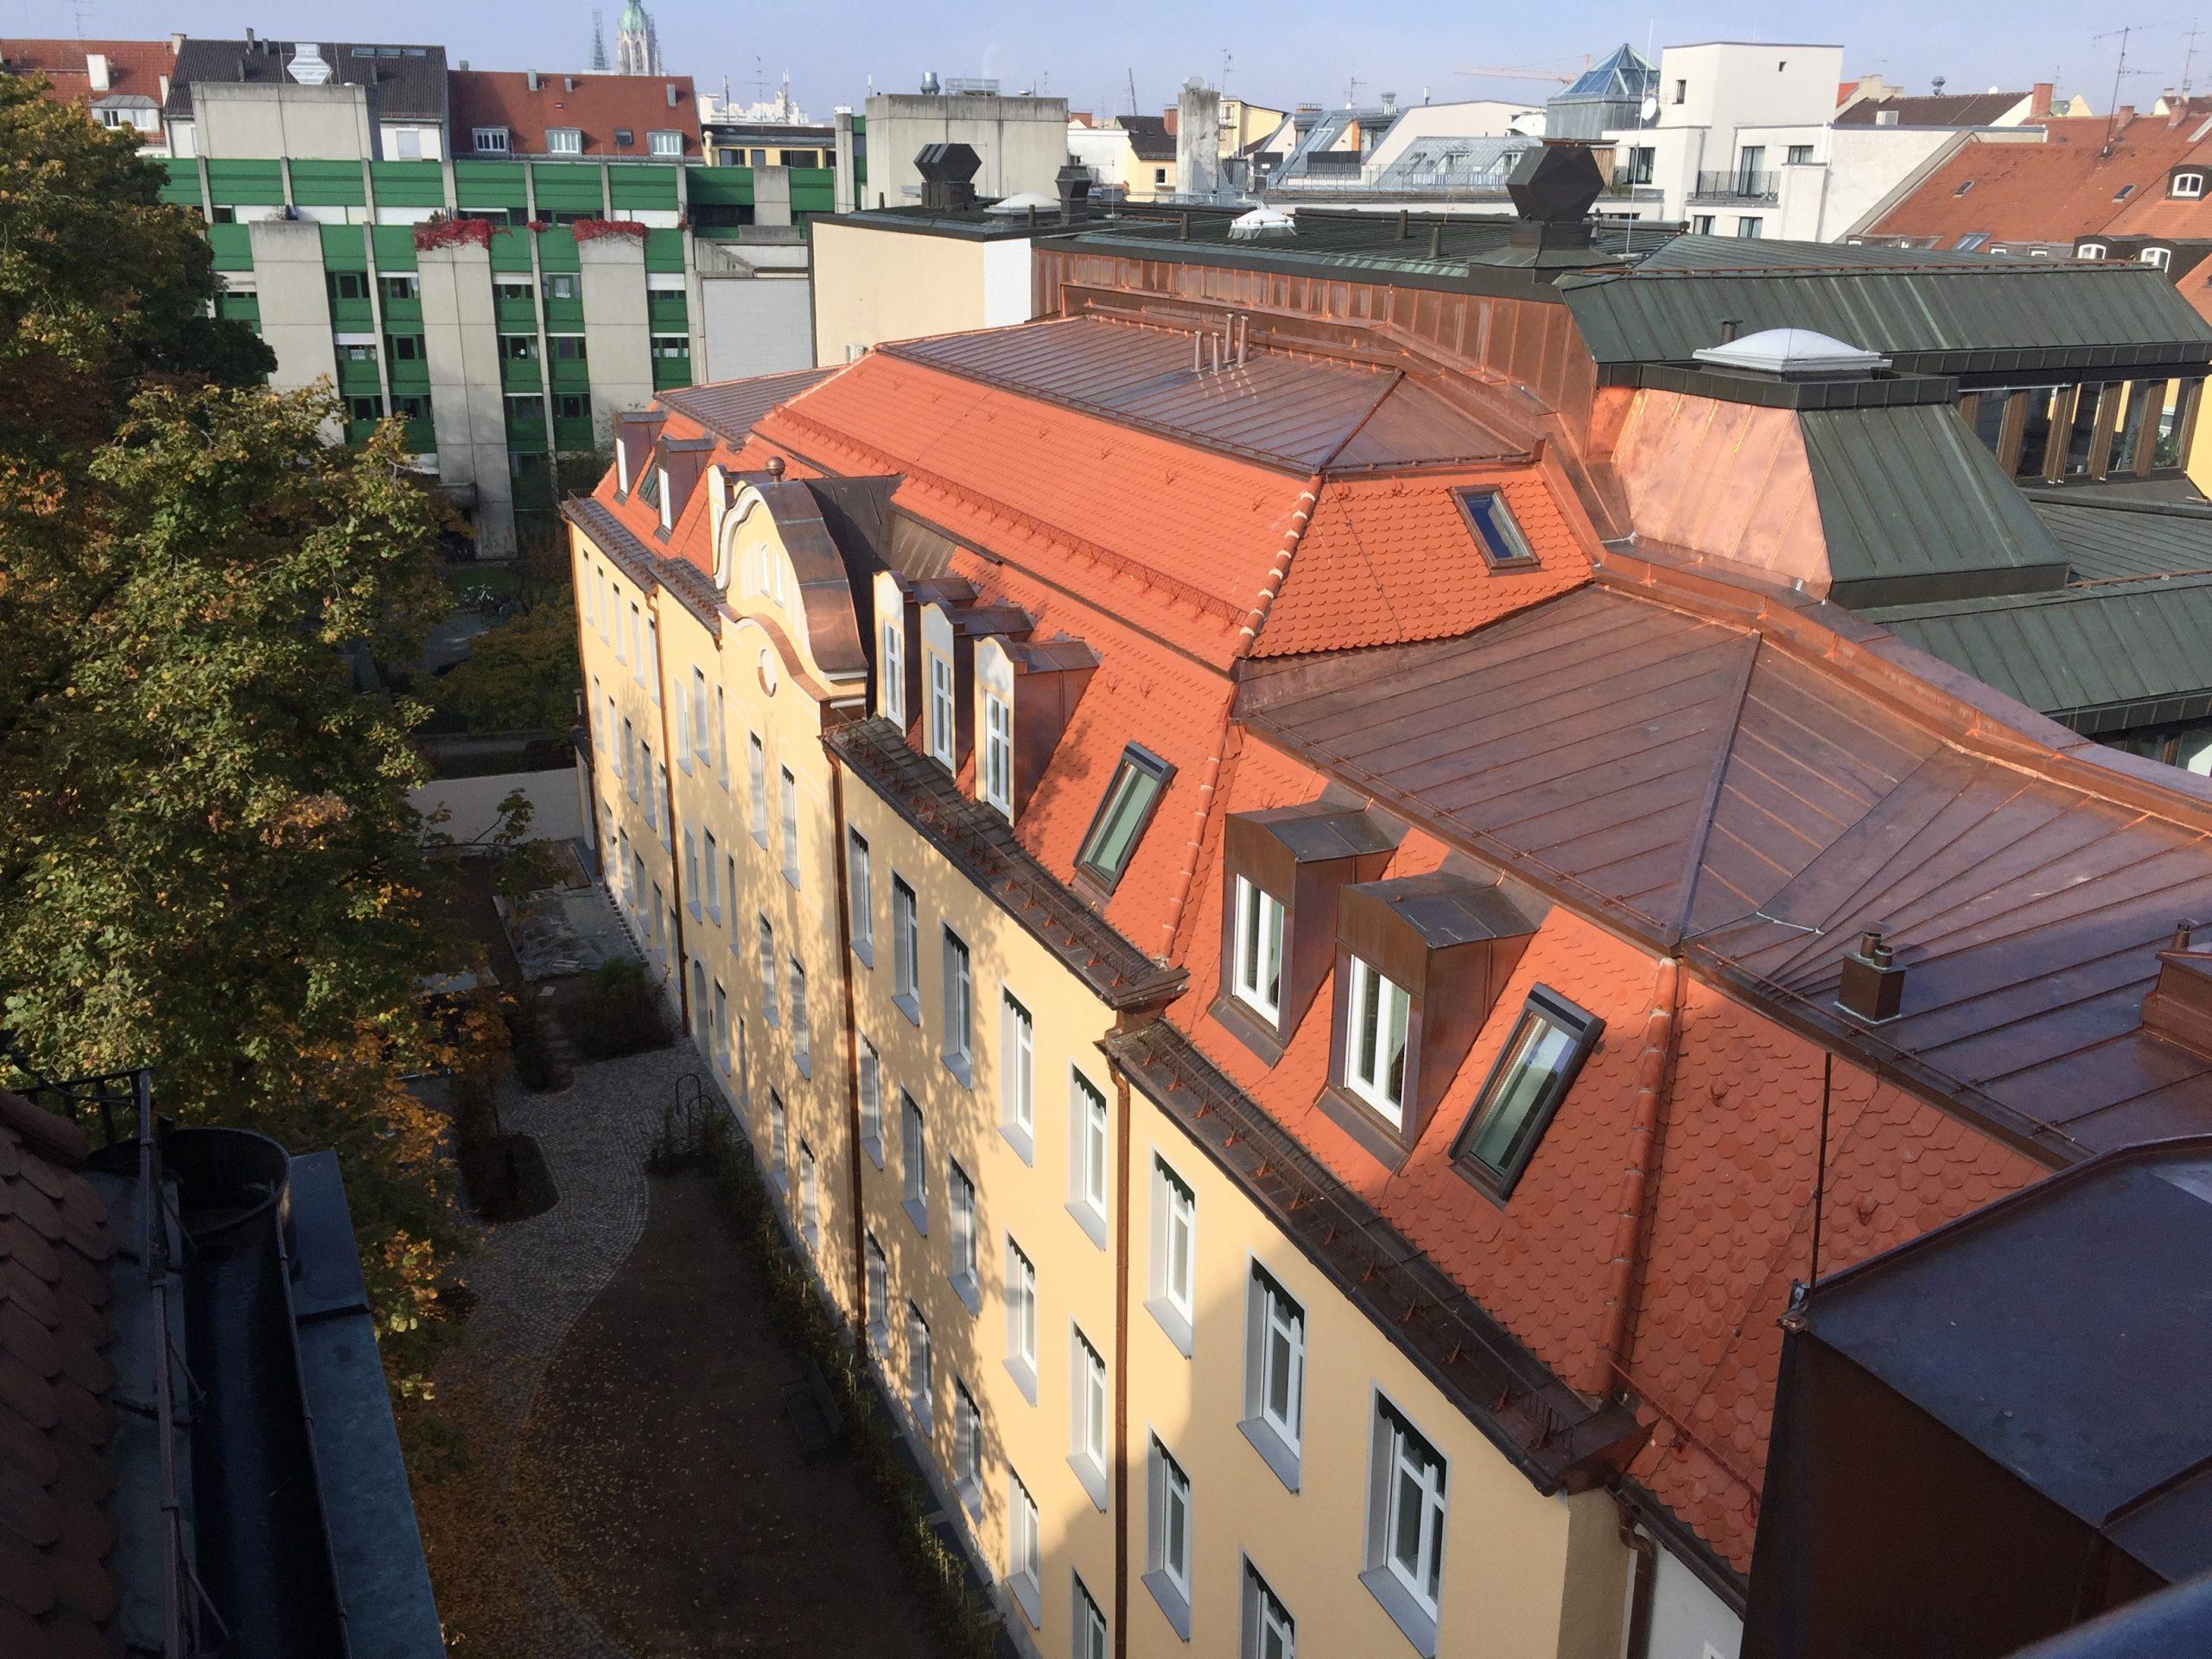 Projektentwicklung, Planung, Bauherrnvertretung Umnutzung Altenheim im Denkmalschutz - Fassadenpreis 2017